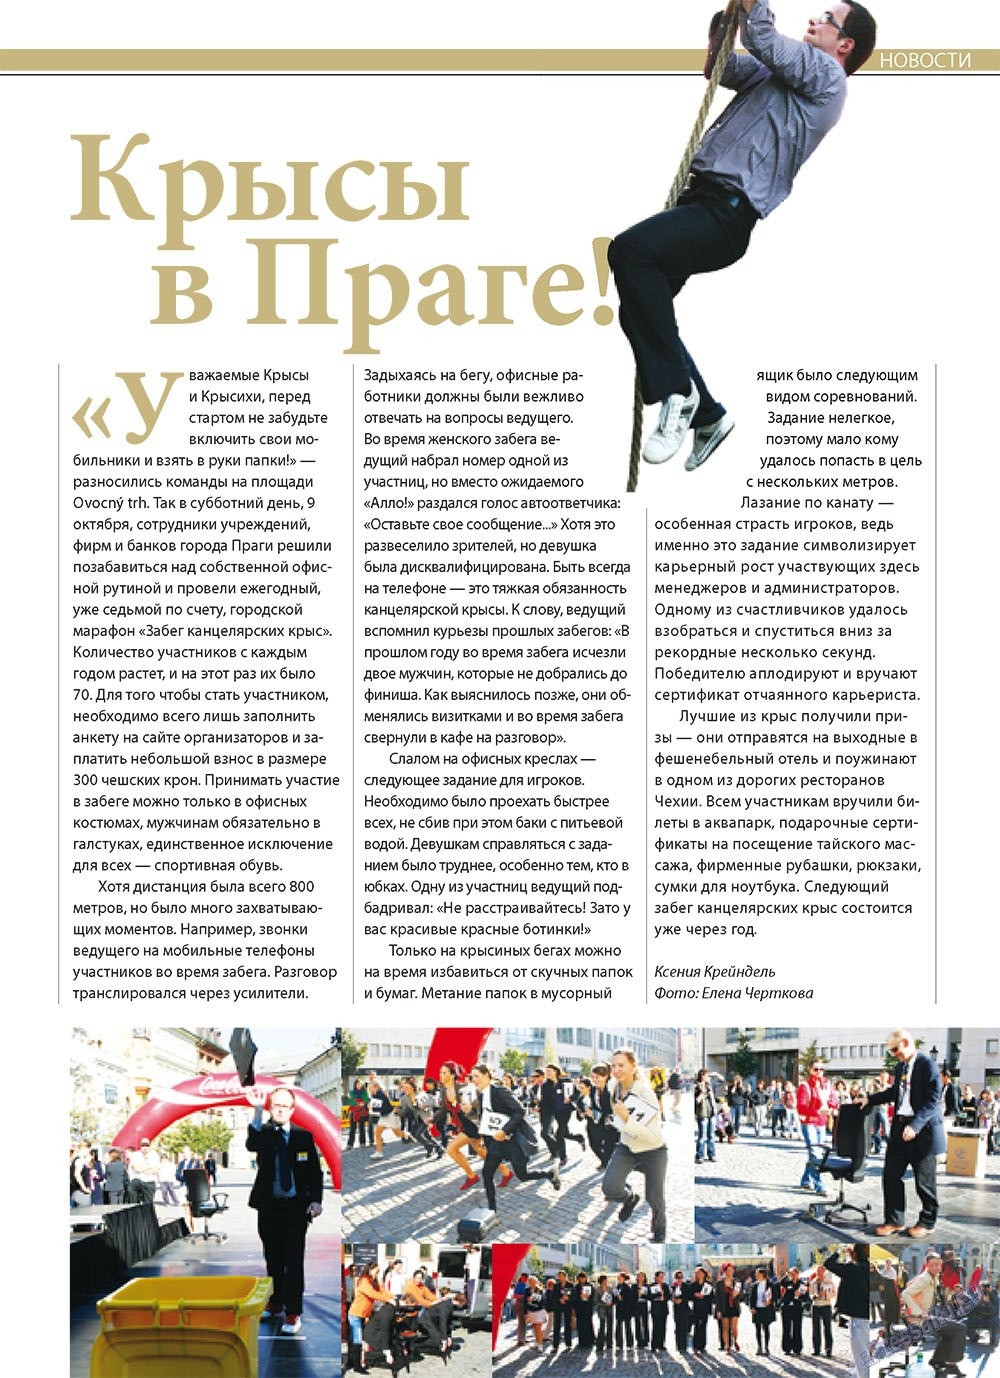 Артек (журнал). 2010 год, номер 5, стр. 13